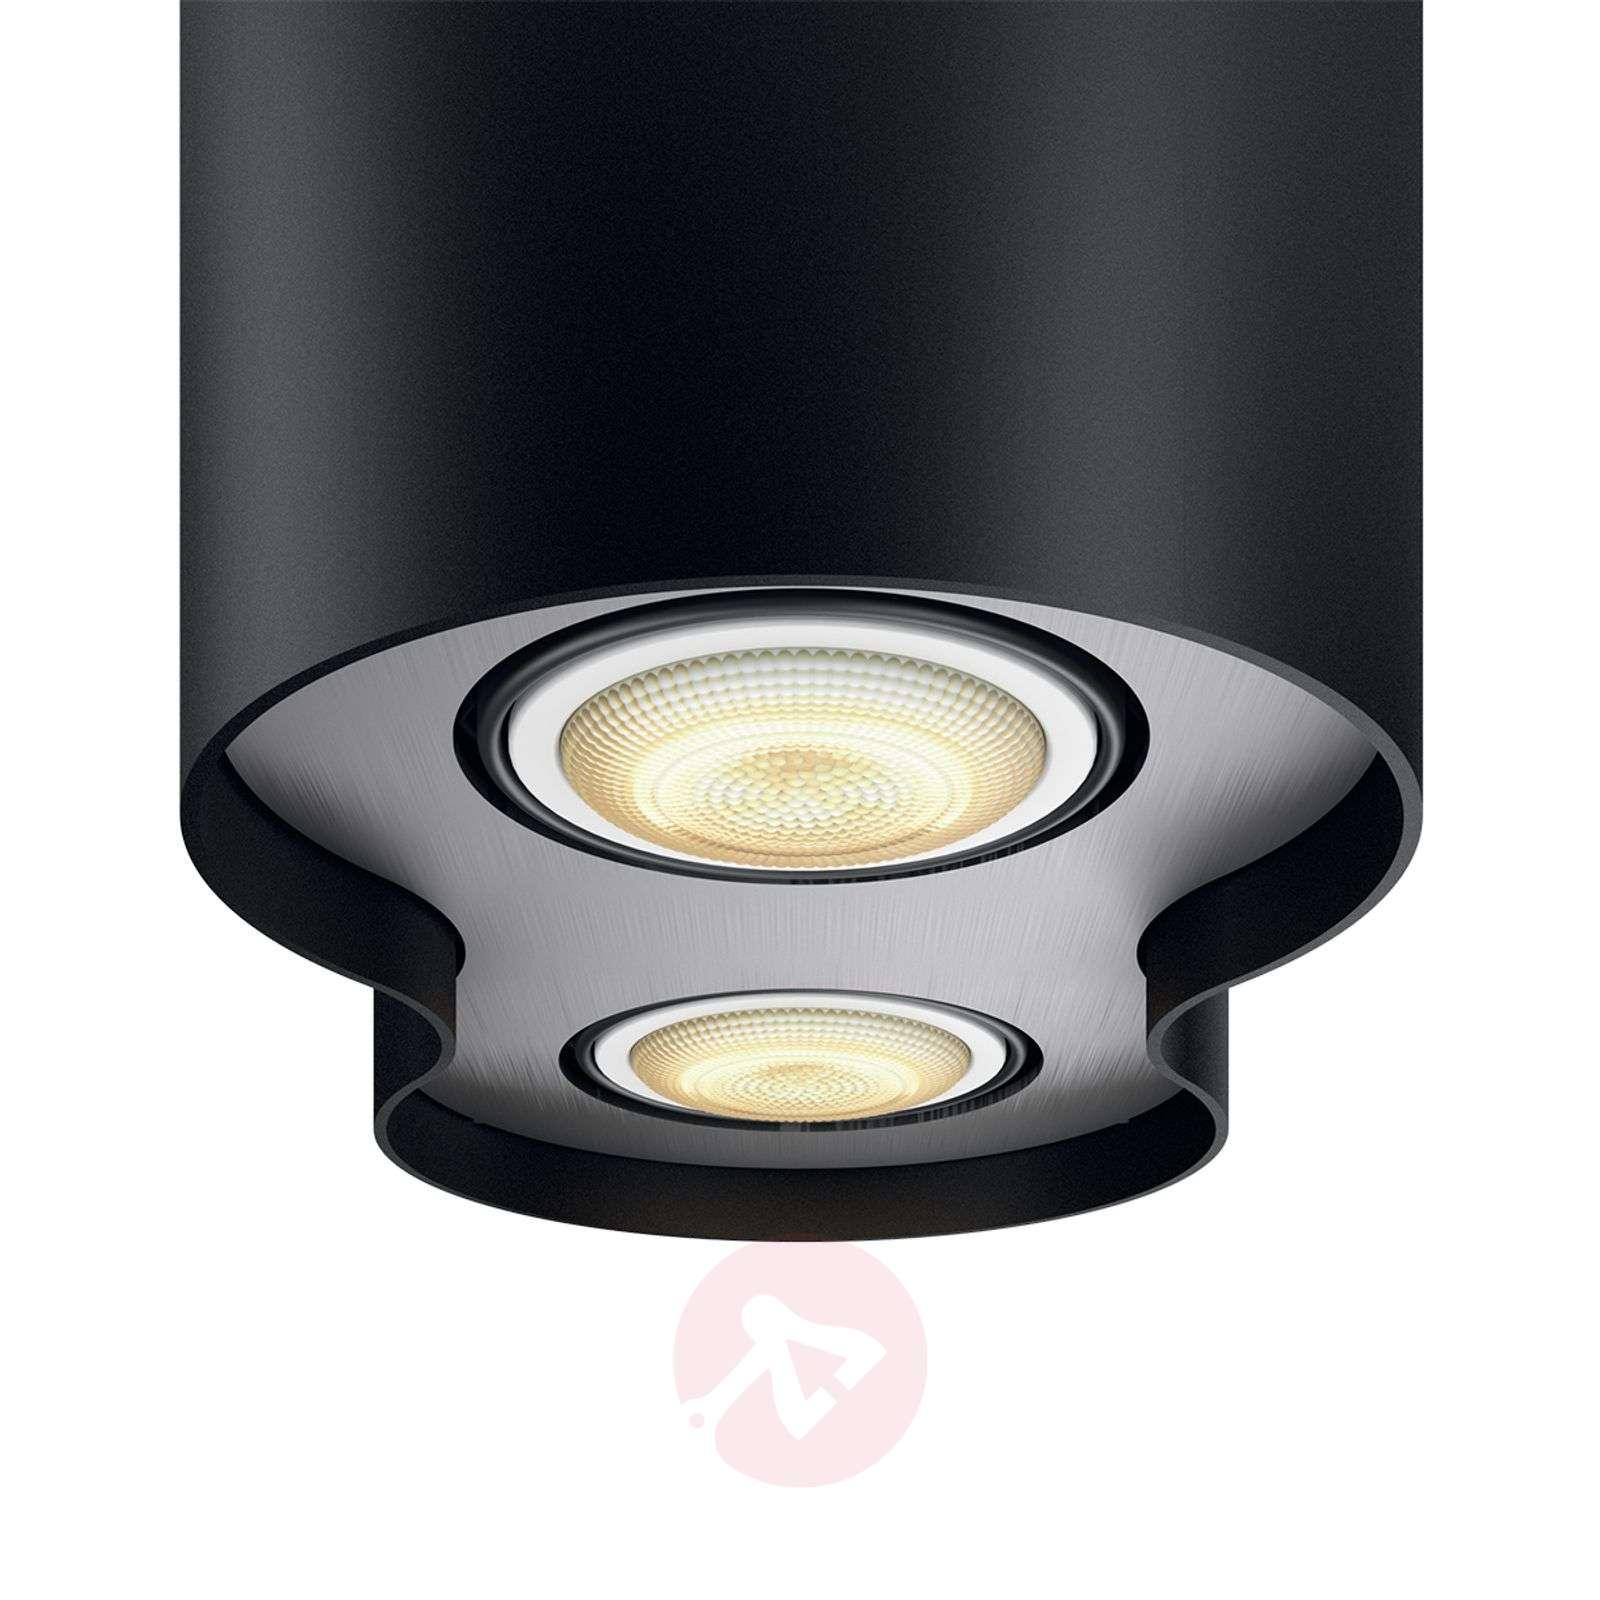 Philips Hue LED spotlight Pillar, 2-bulb,-7531882-01